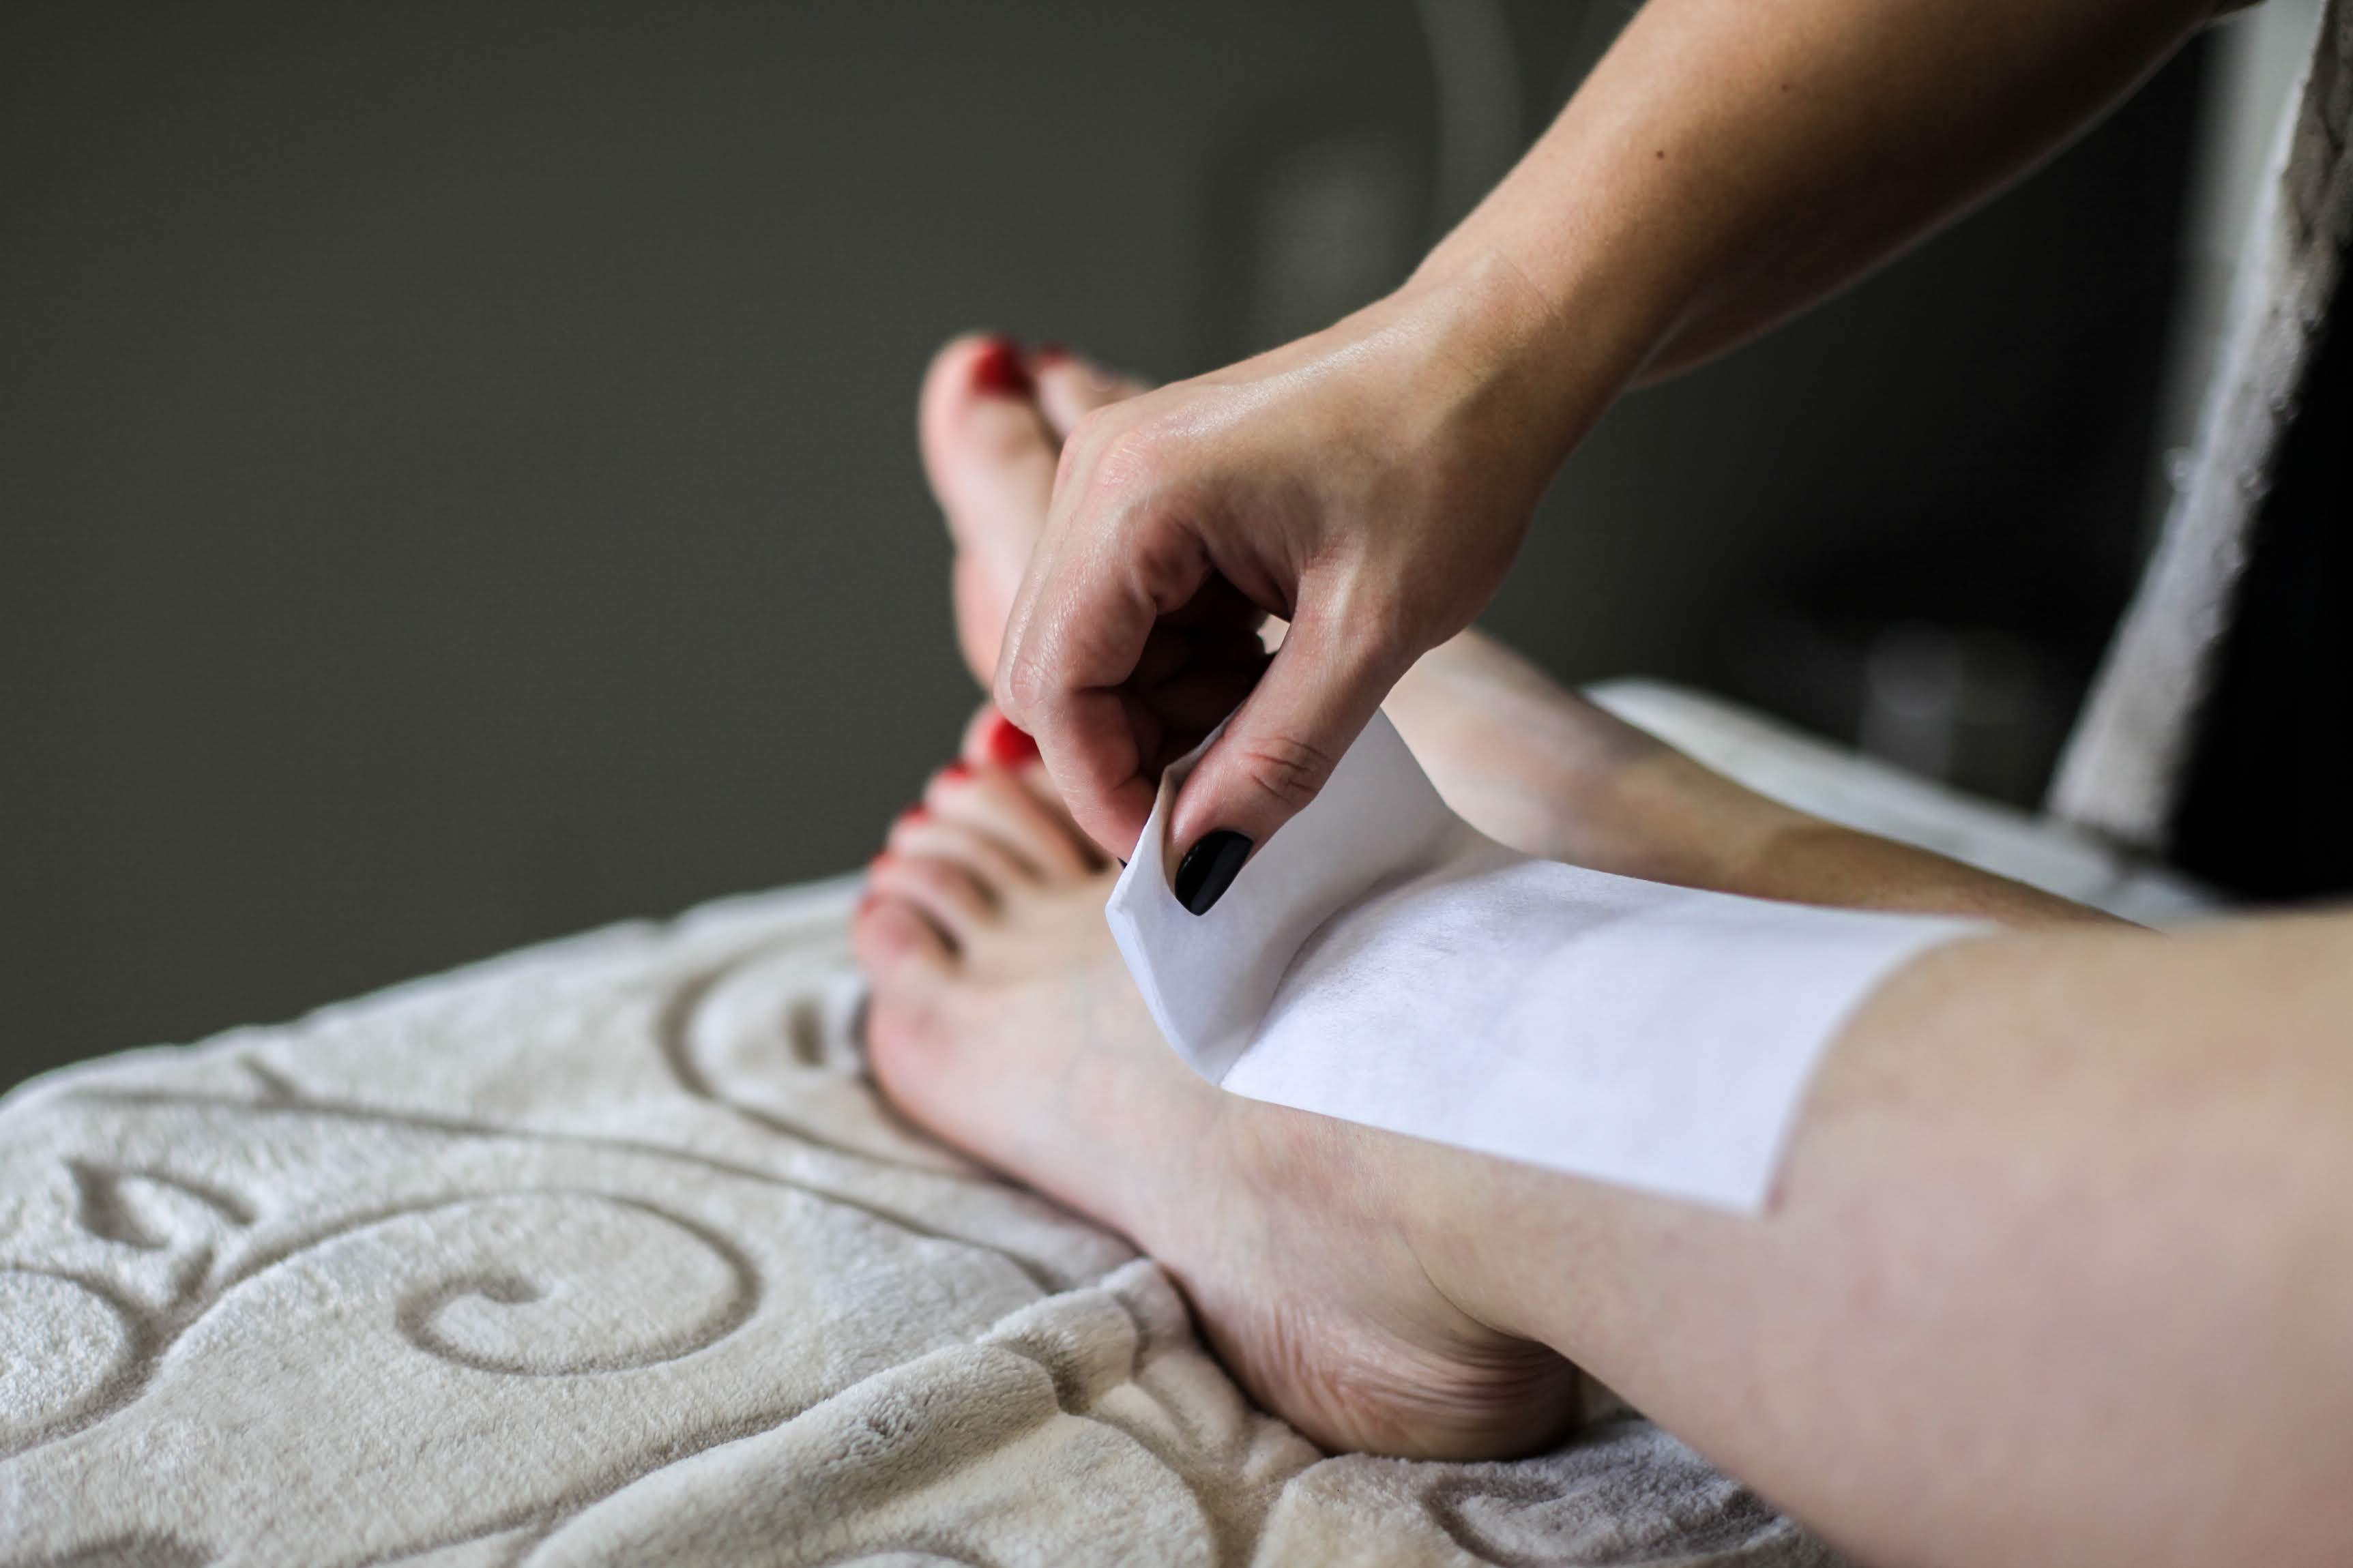 Leg Wax Being Done